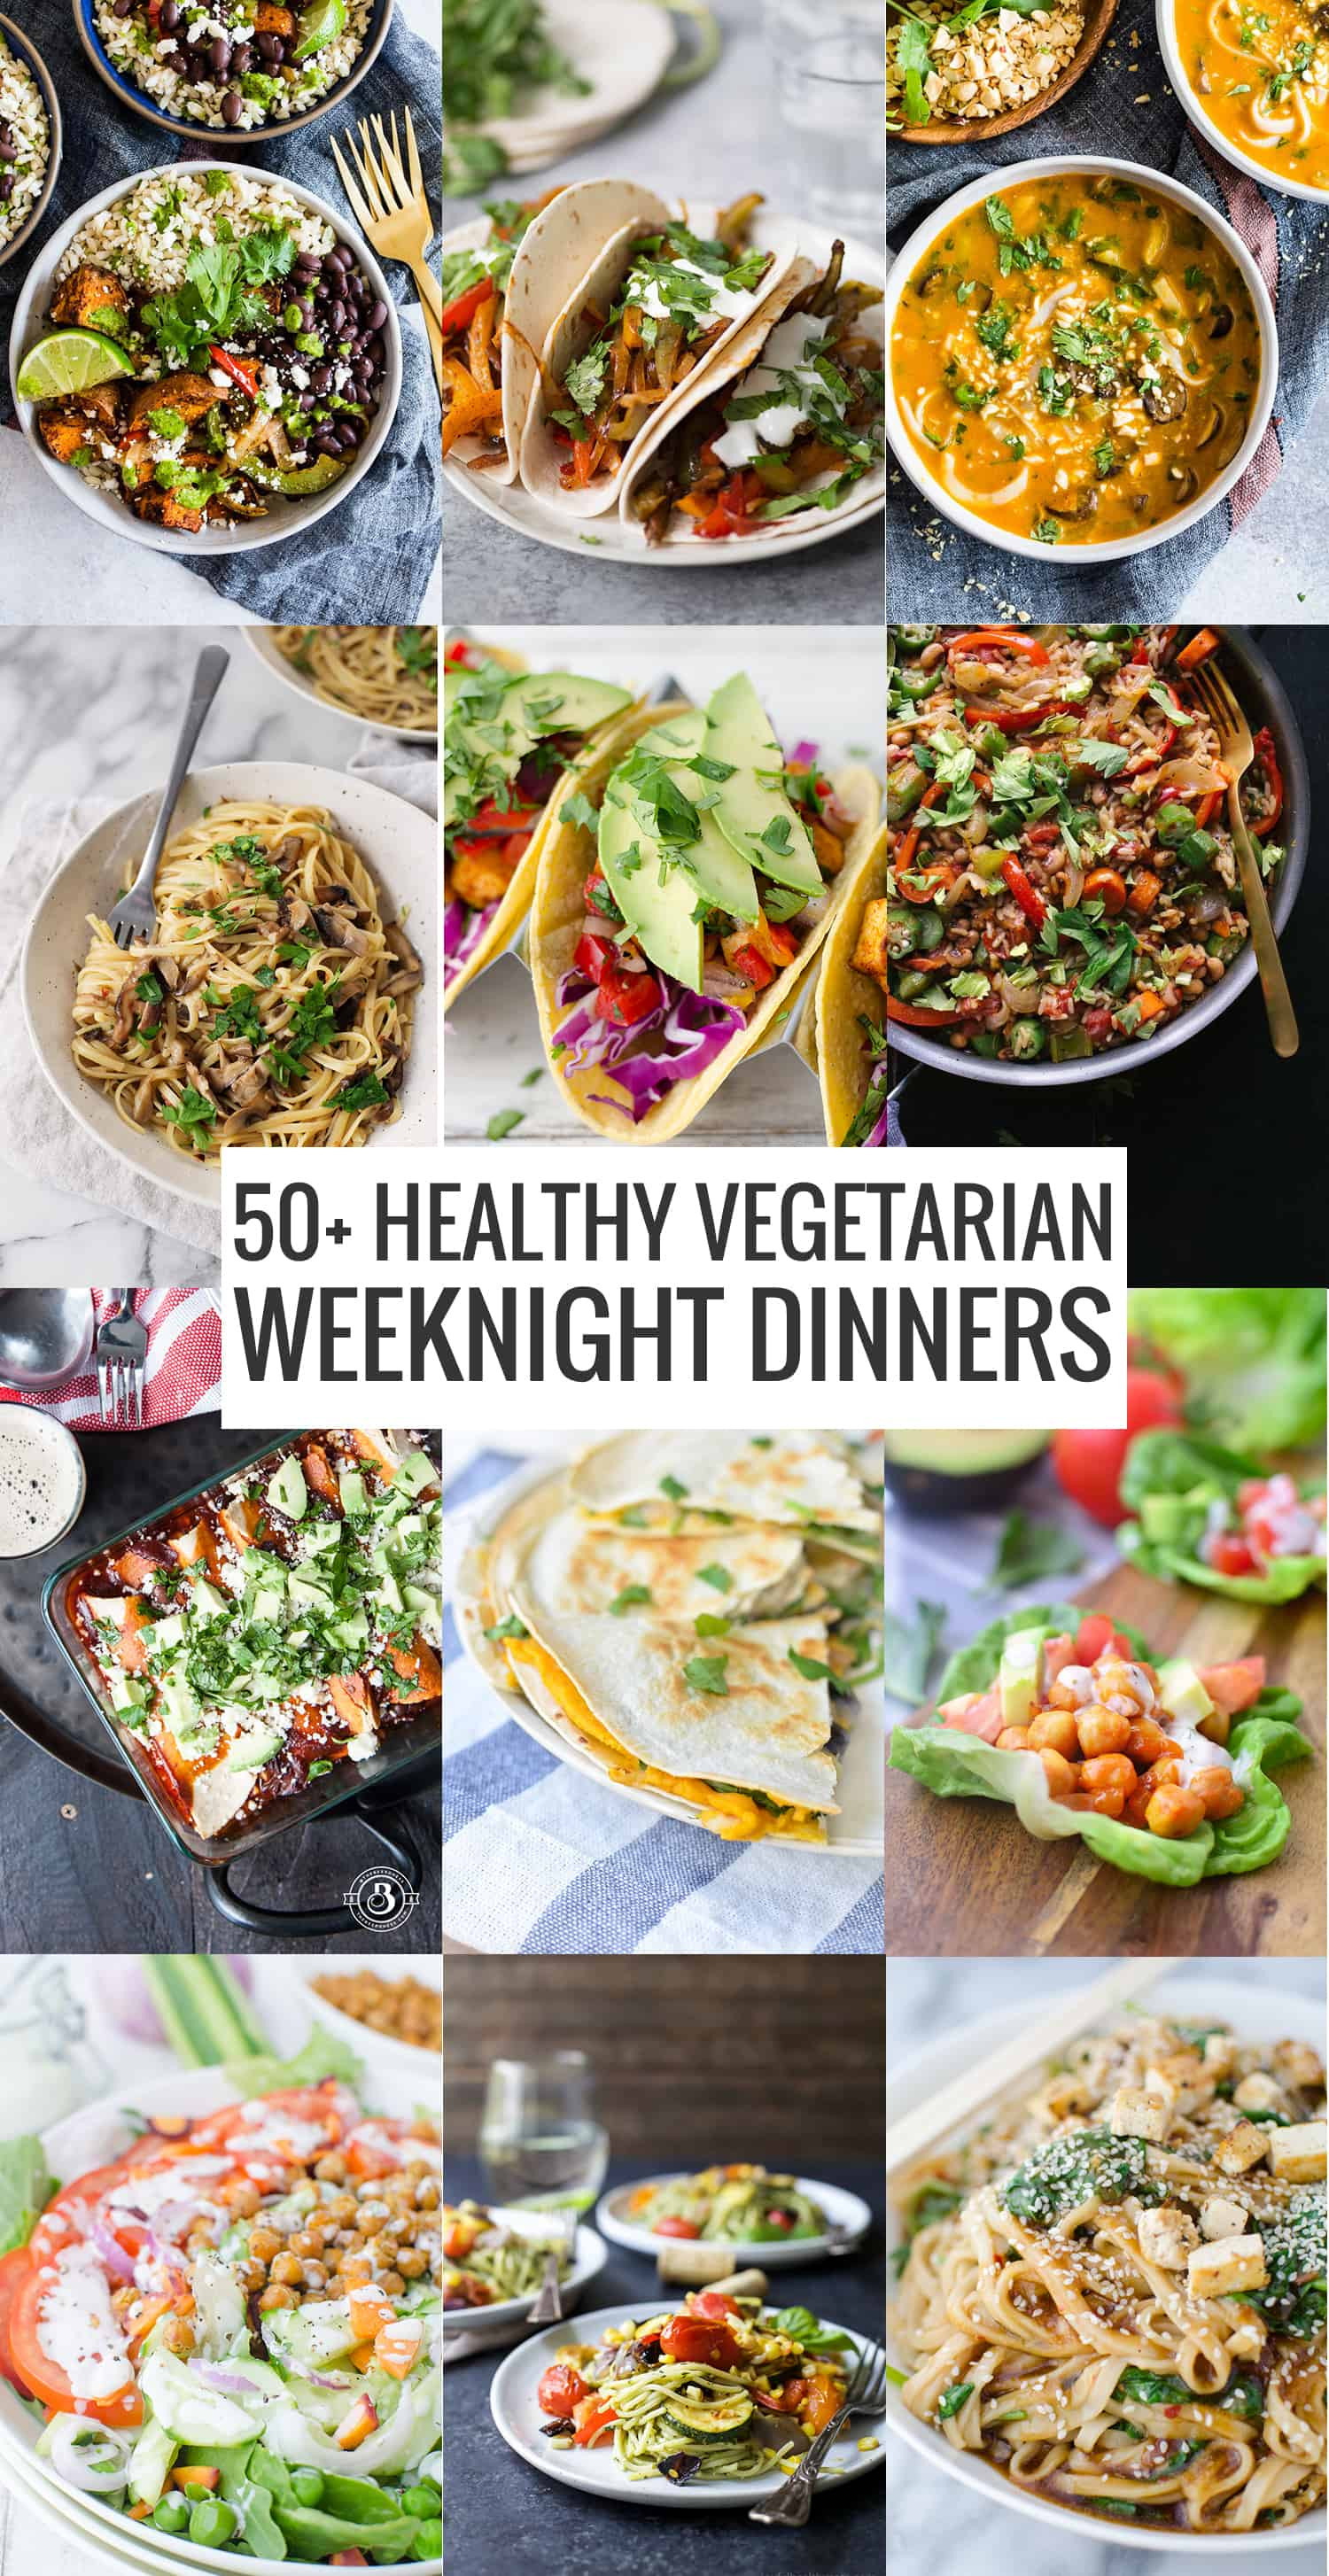 Healthy Weeknight Dinners  50 Healthy Ve arian Weeknight Dinners Delish Knowledge